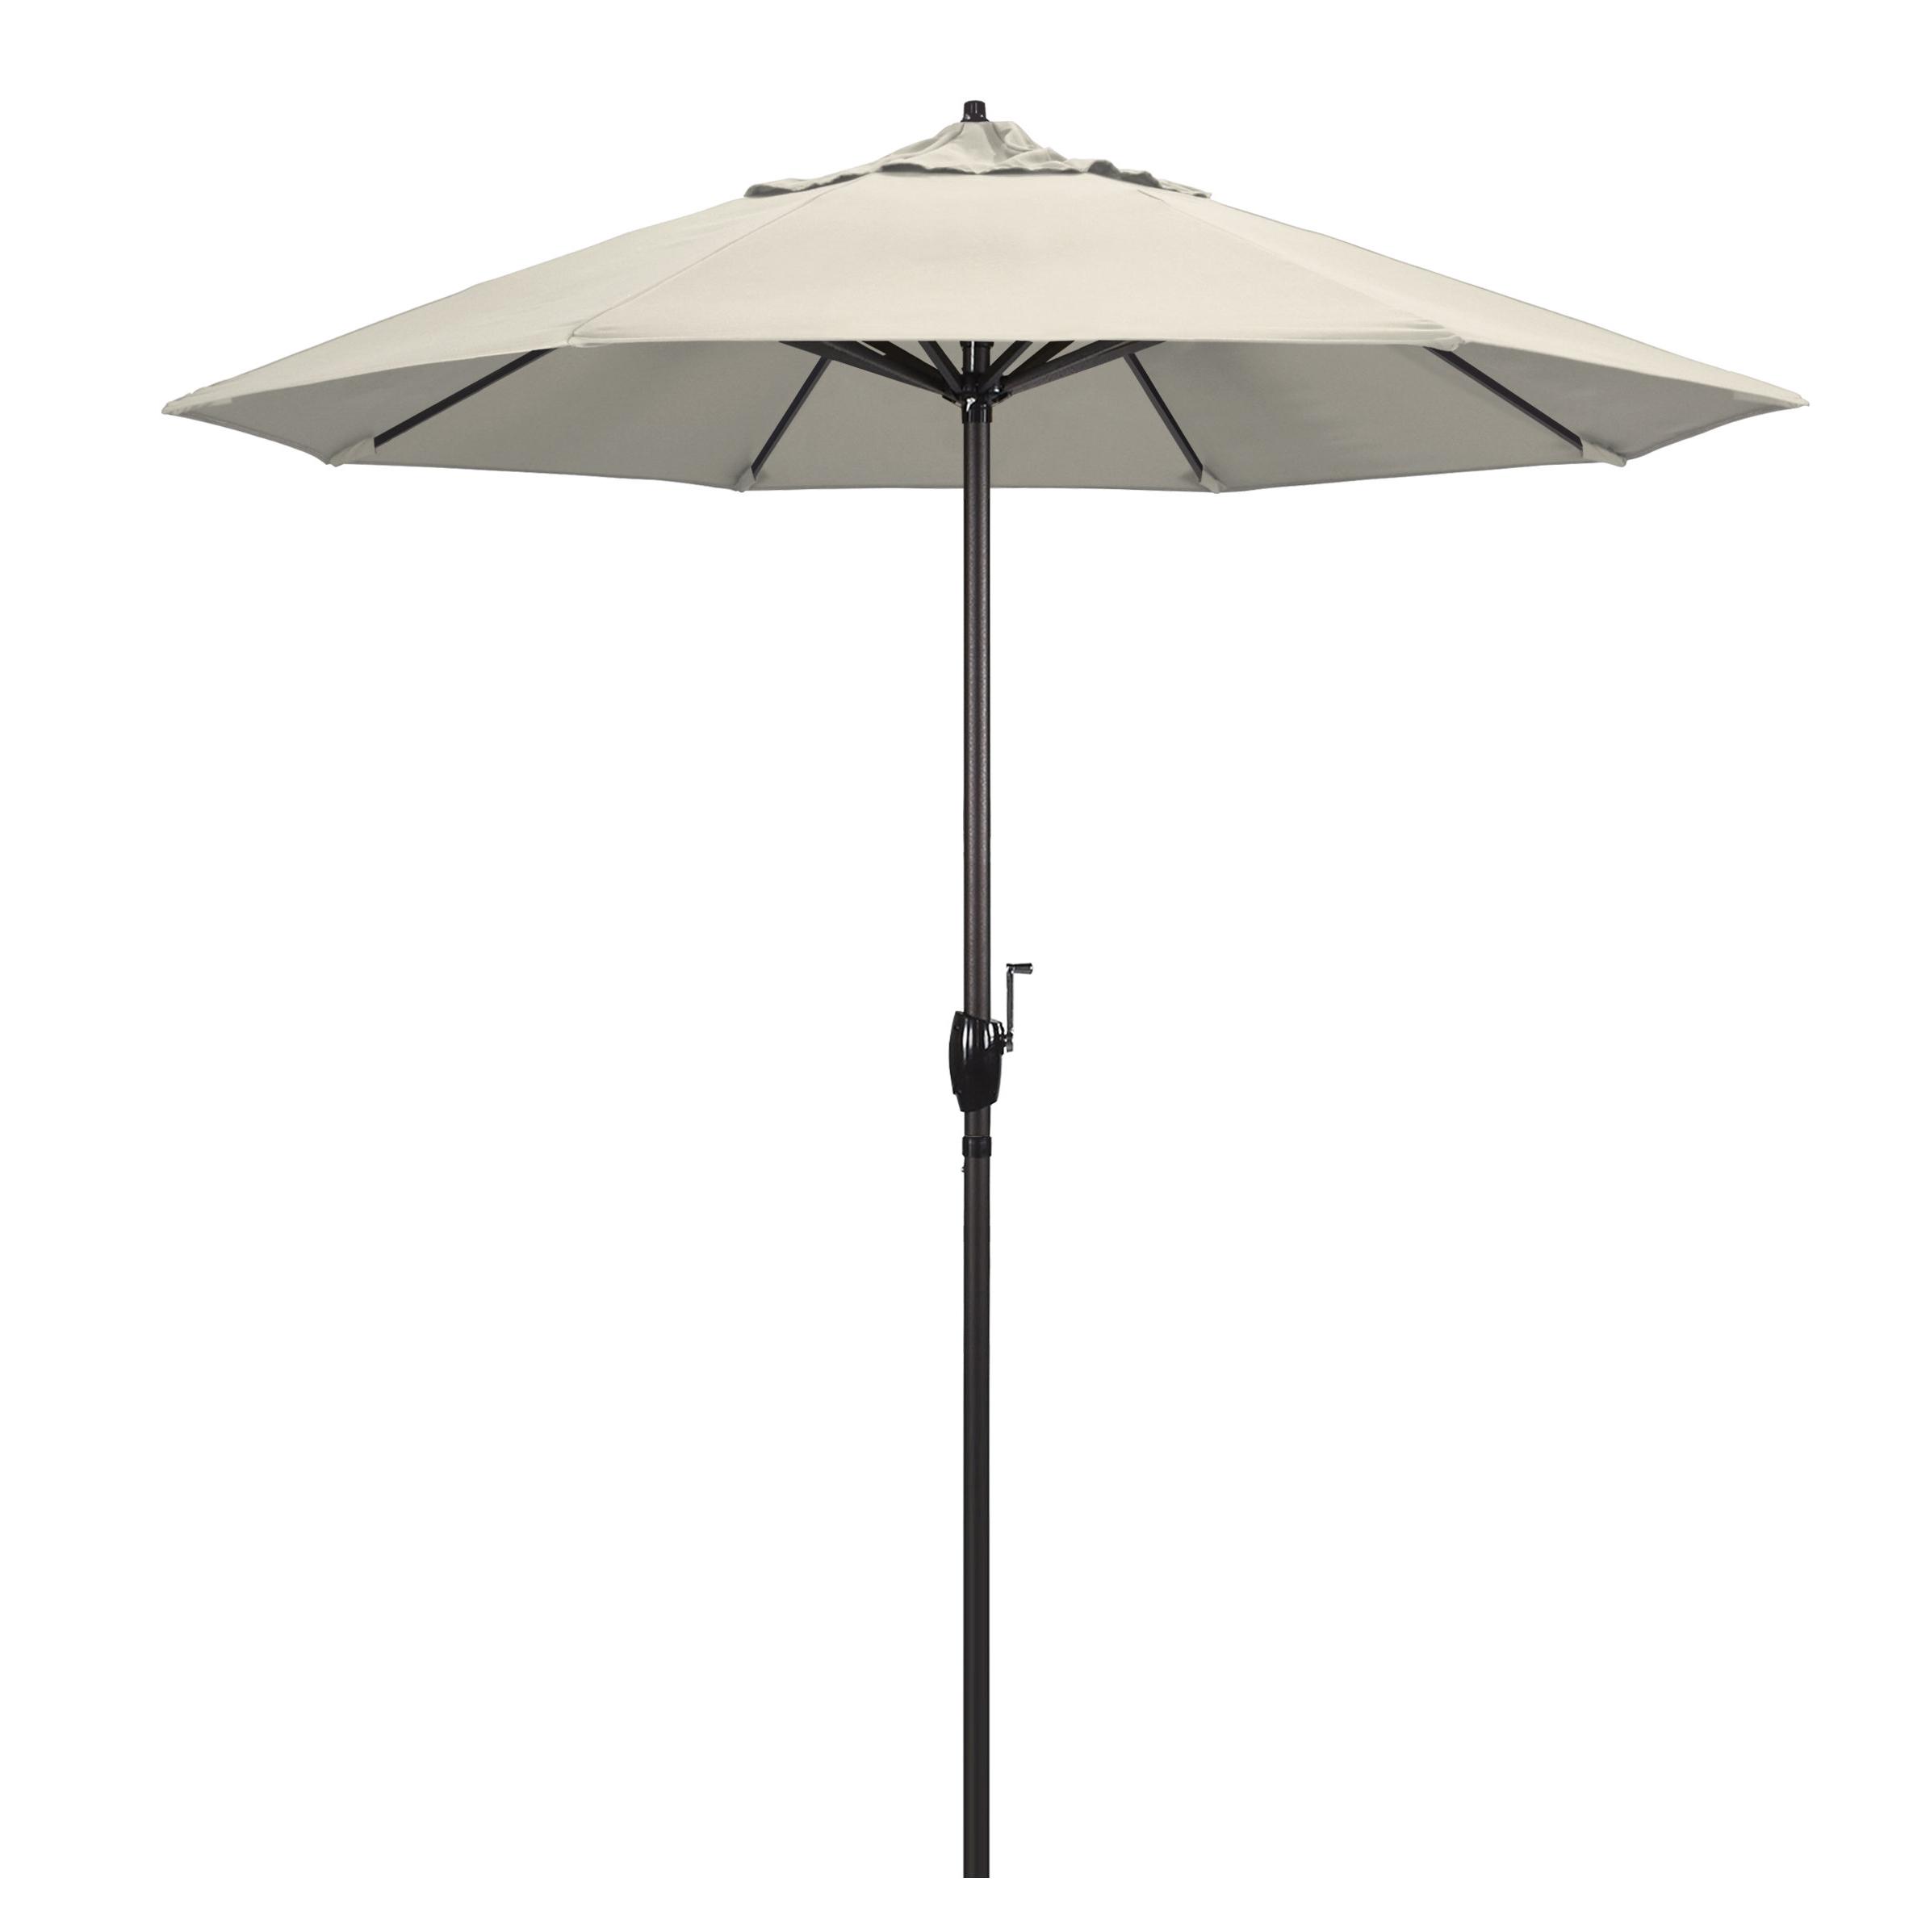 Famous Canora Grey Nunn 8' Market Sunbrella Umbrella With Regard To Crowland Market Sunbrella Umbrellas (View 18 of 20)